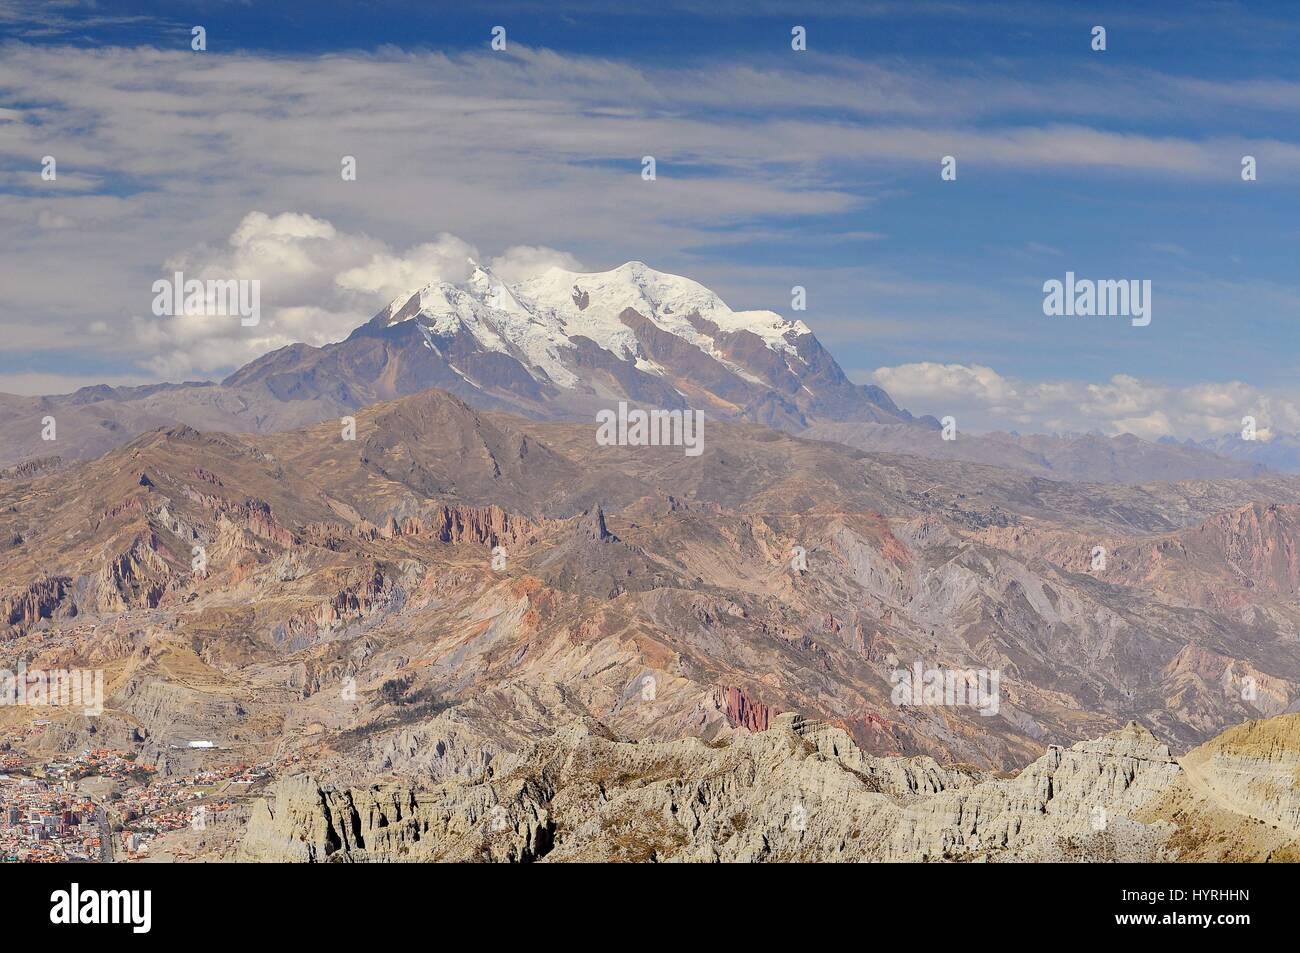 Bolivia, view of Cordillera Real from La Paz - Stock Image